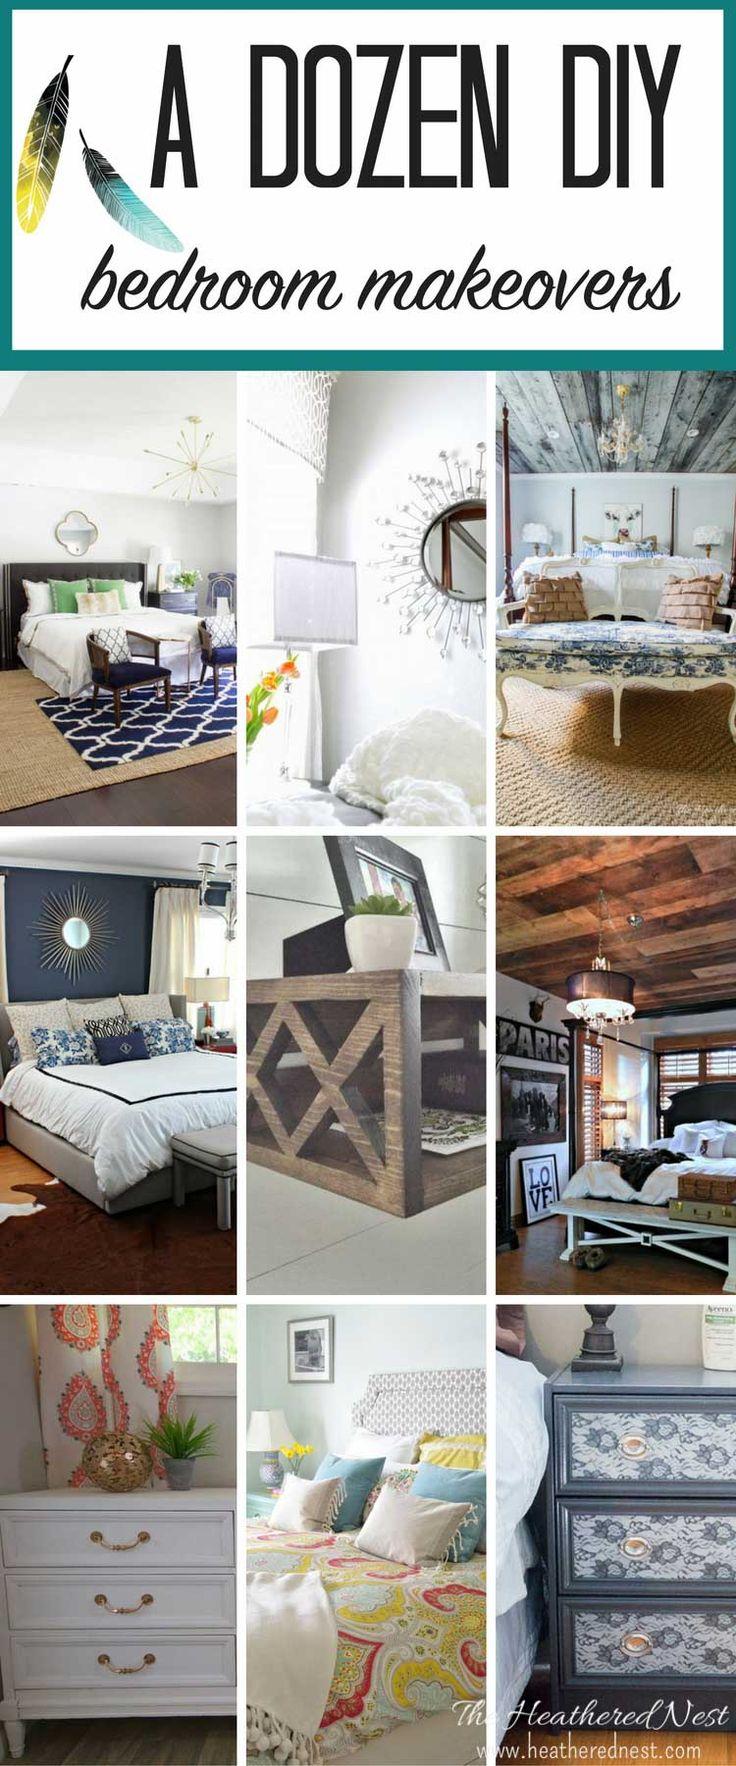 Diy master bedroom makeover - 12 Fantastic Diy Bedroom Ideas From Floating Bedside Tables To Barn Board Wood